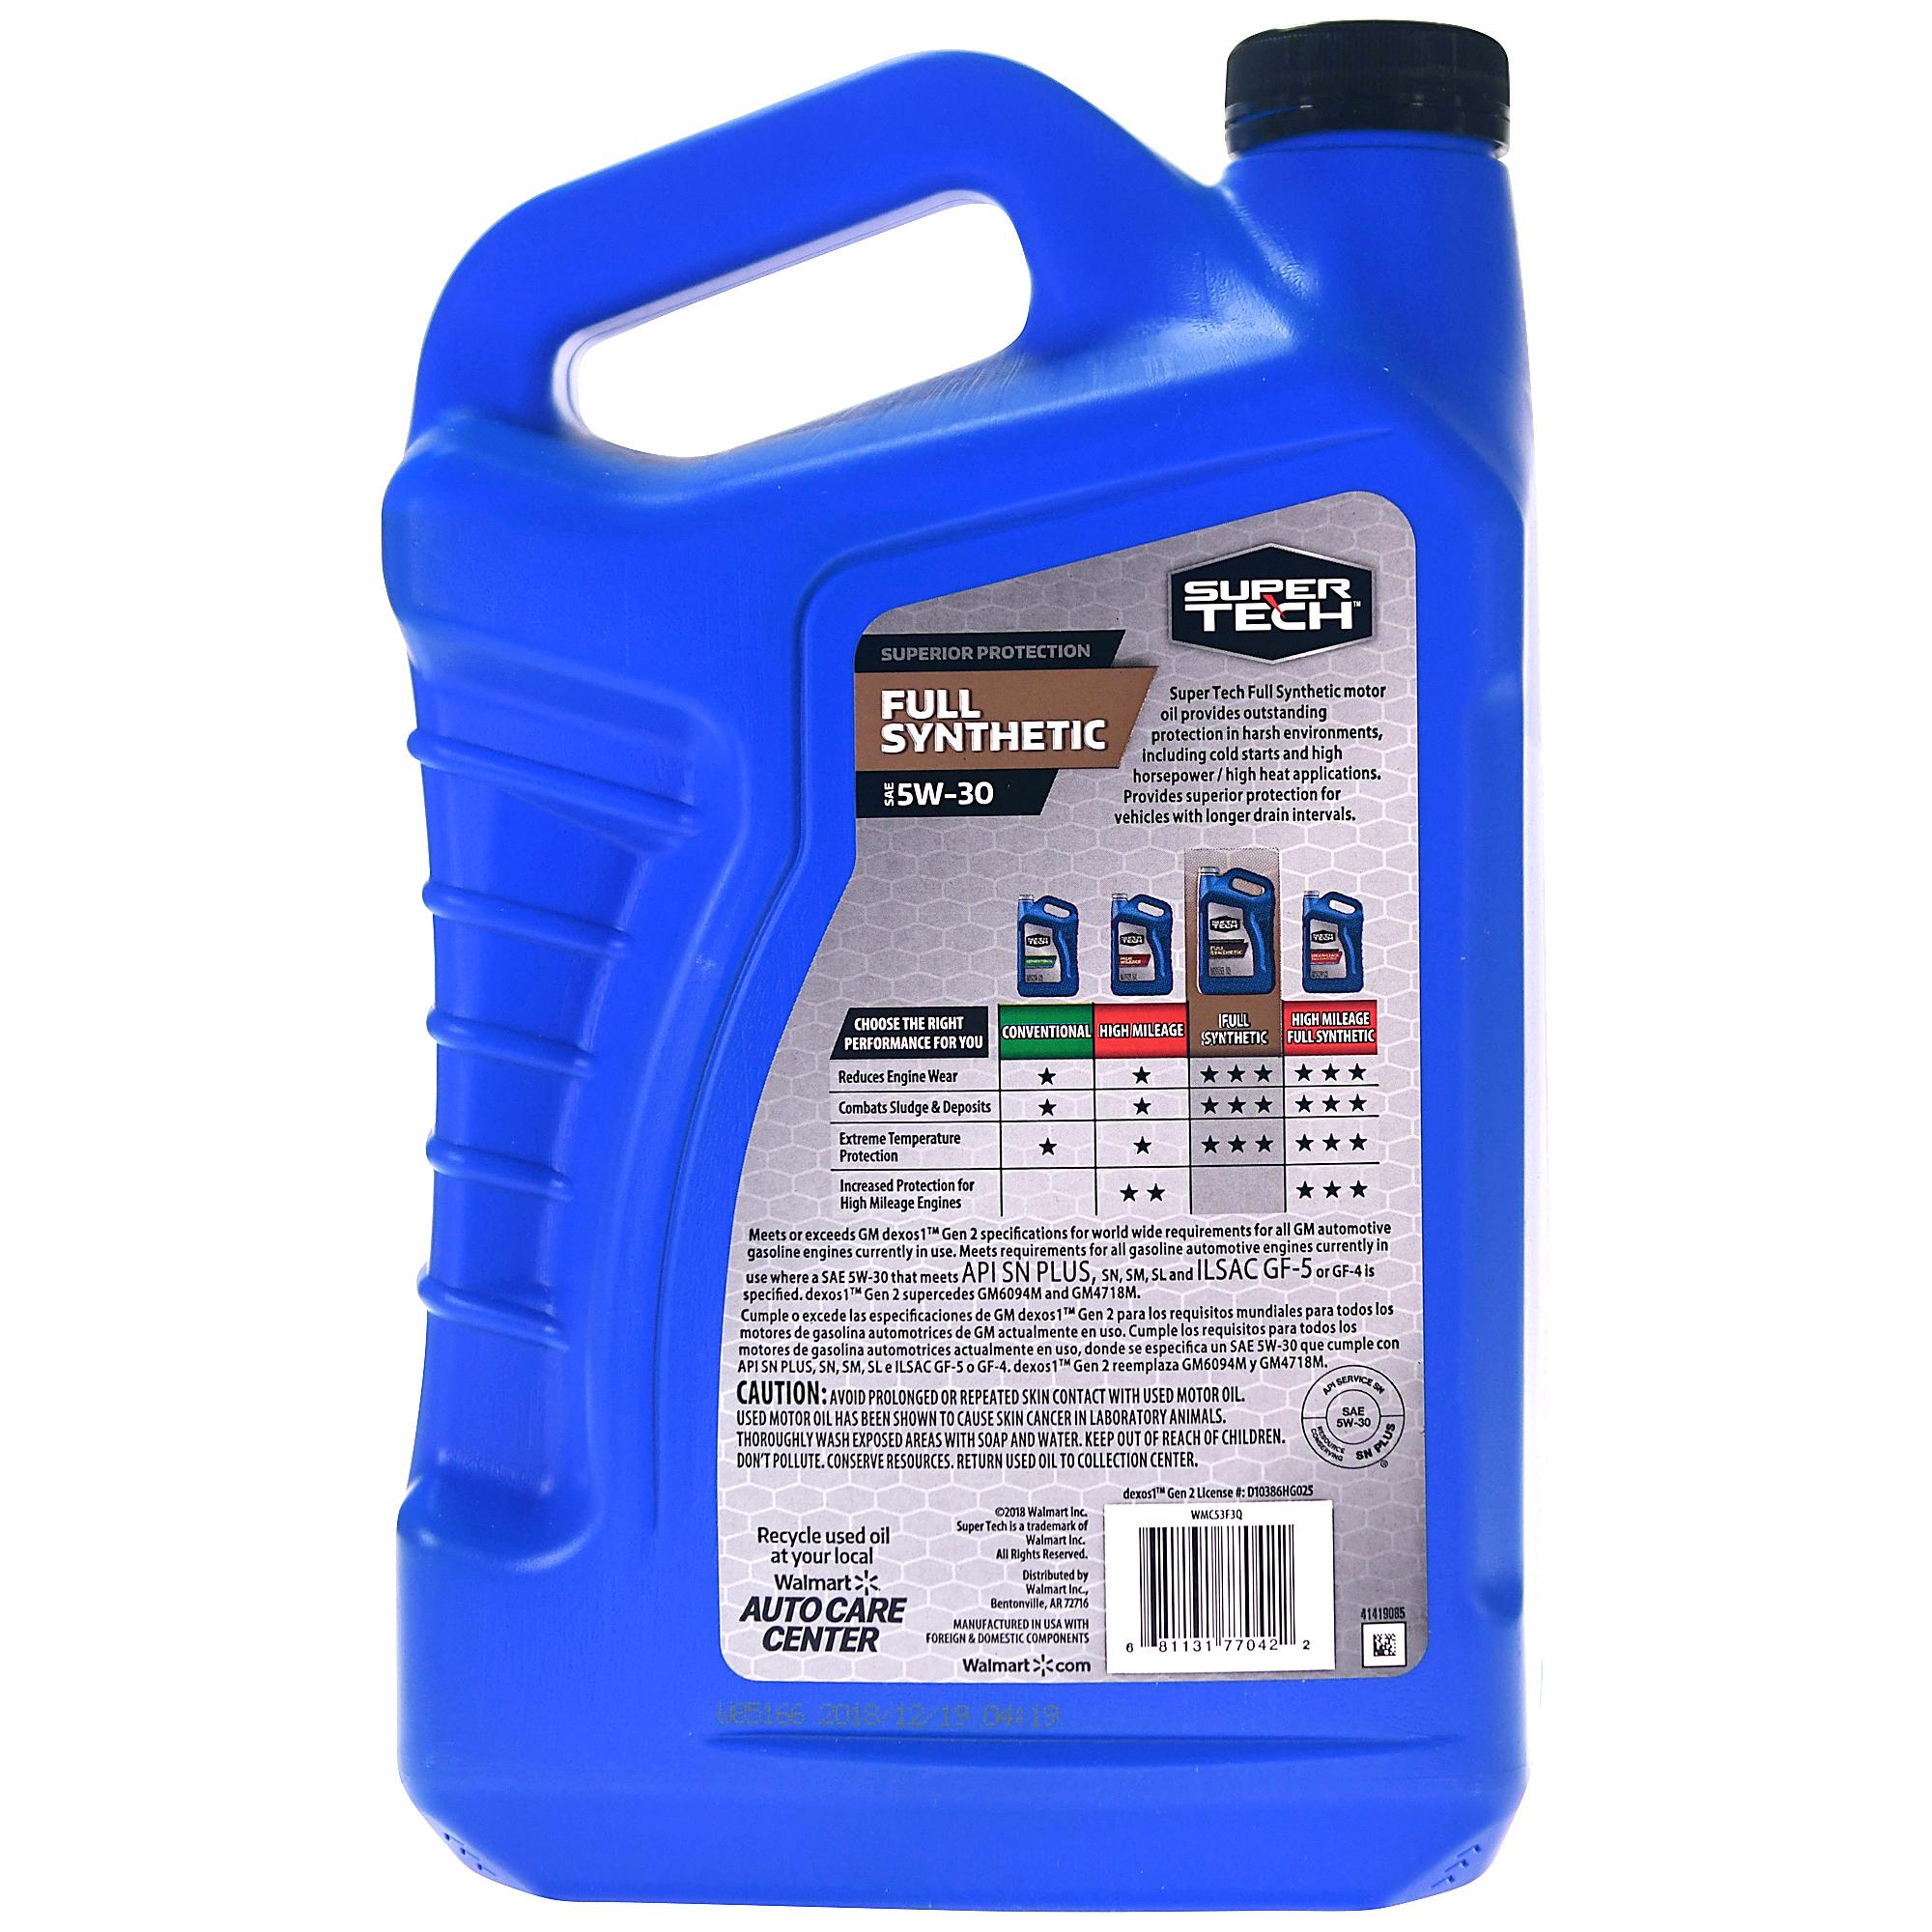 Super Tech Full Synthetic SAE 5W-30 Motor Oil, 5 Quarts